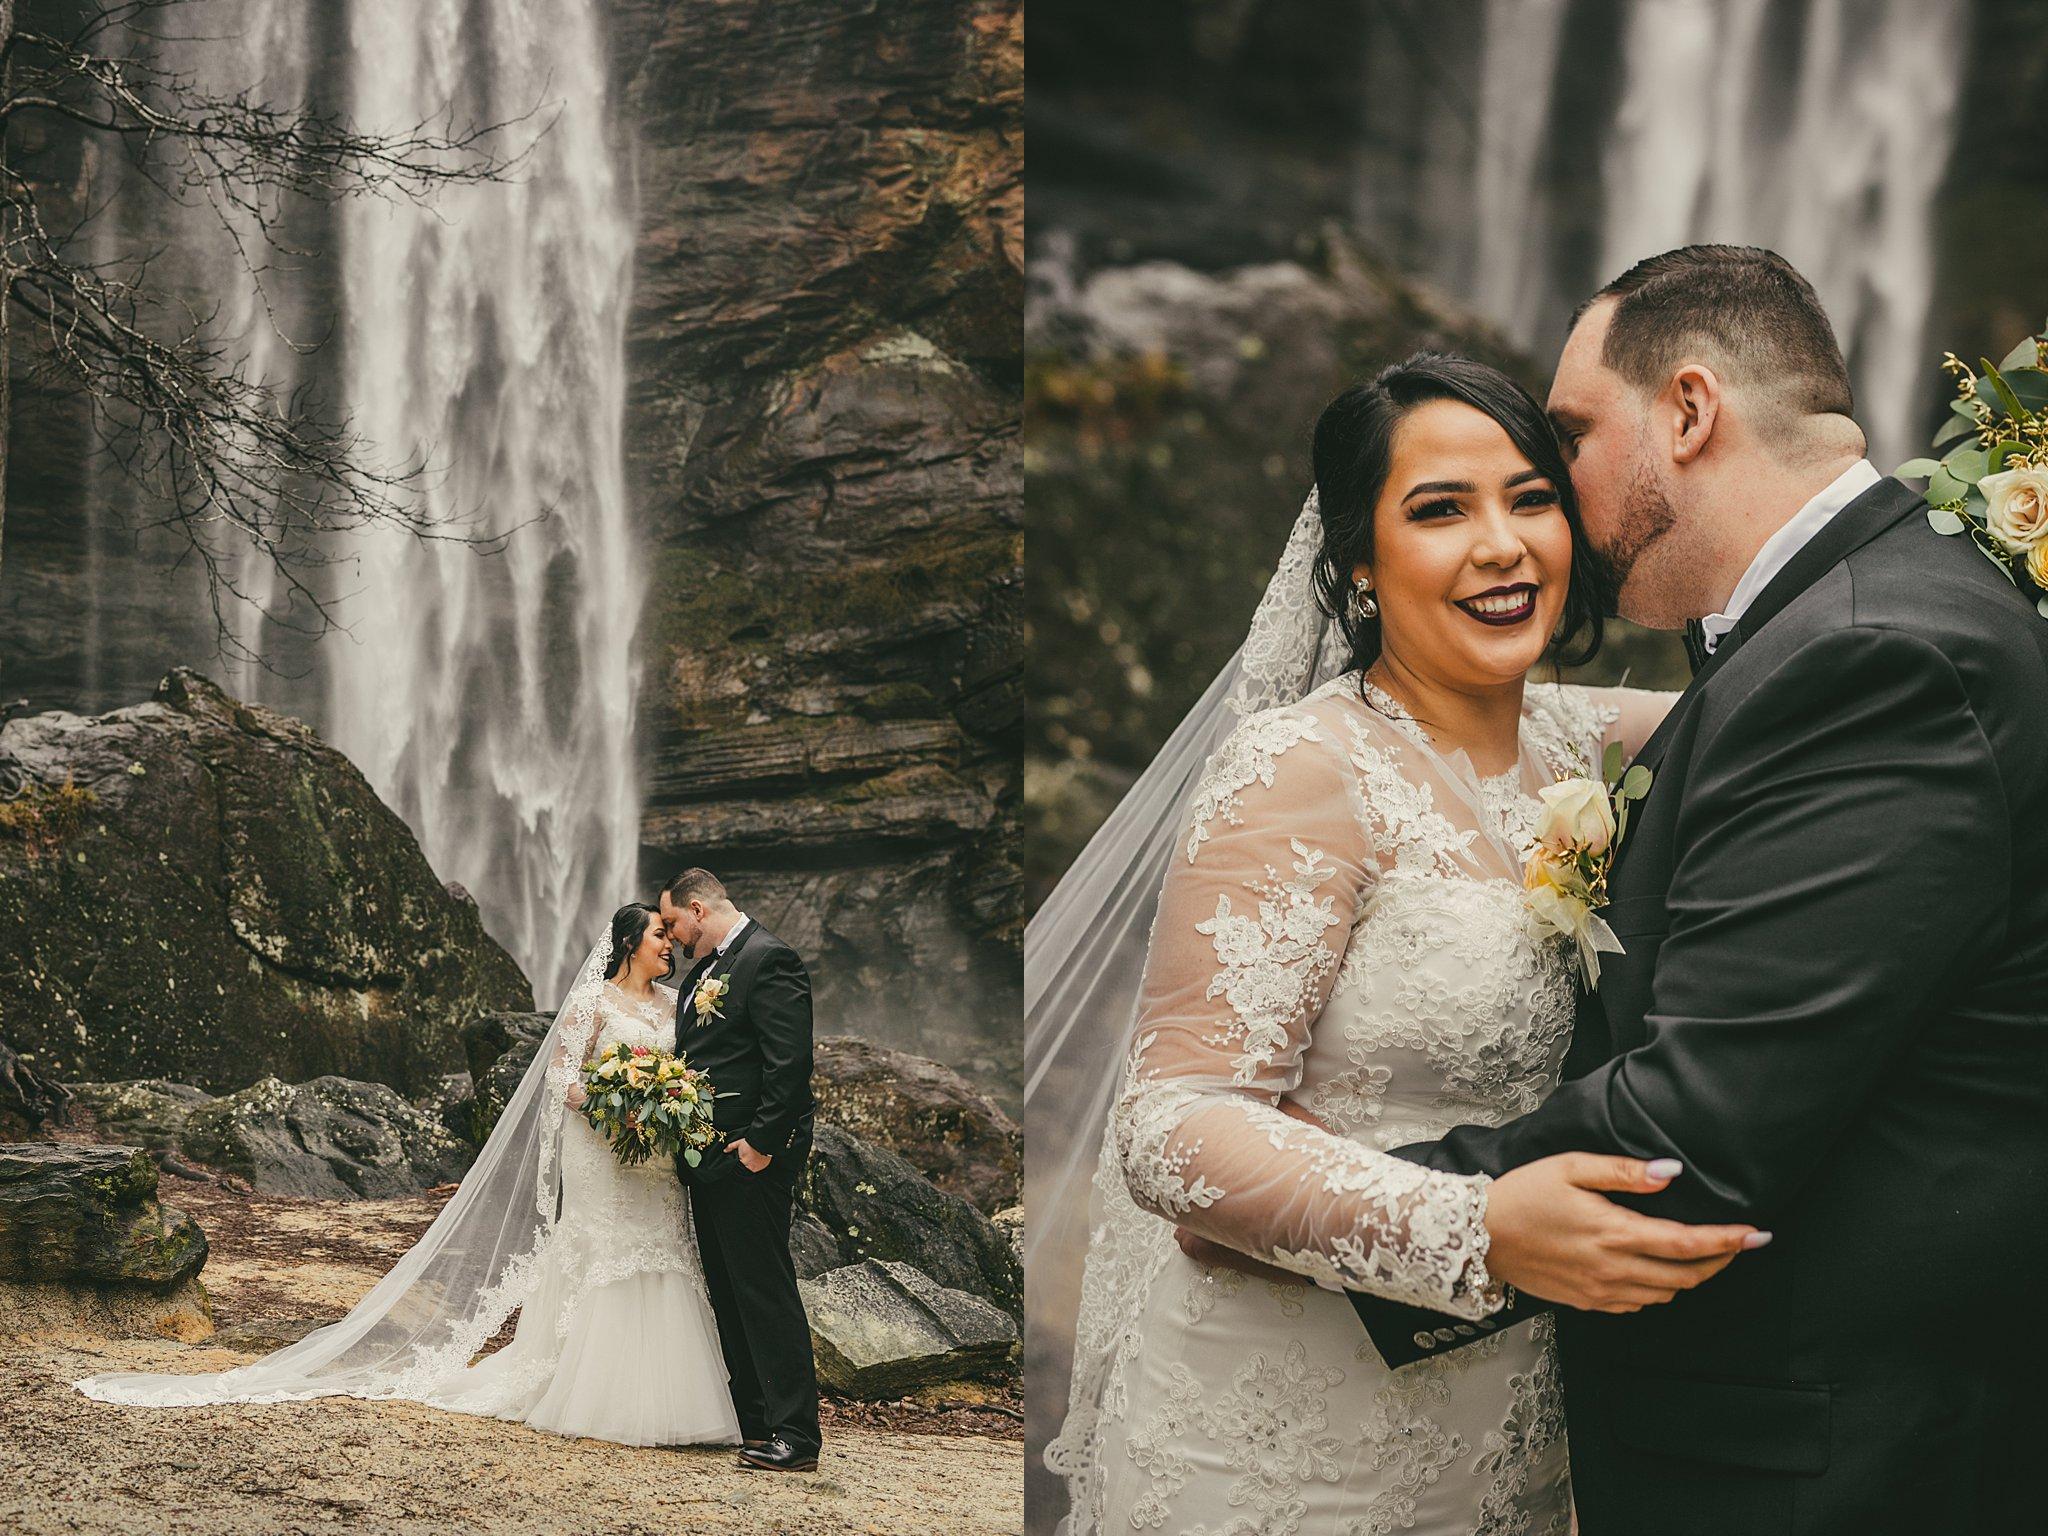 AtlantaWeddingPhotographers Toccoa Falls Destination Waterfall Wedding